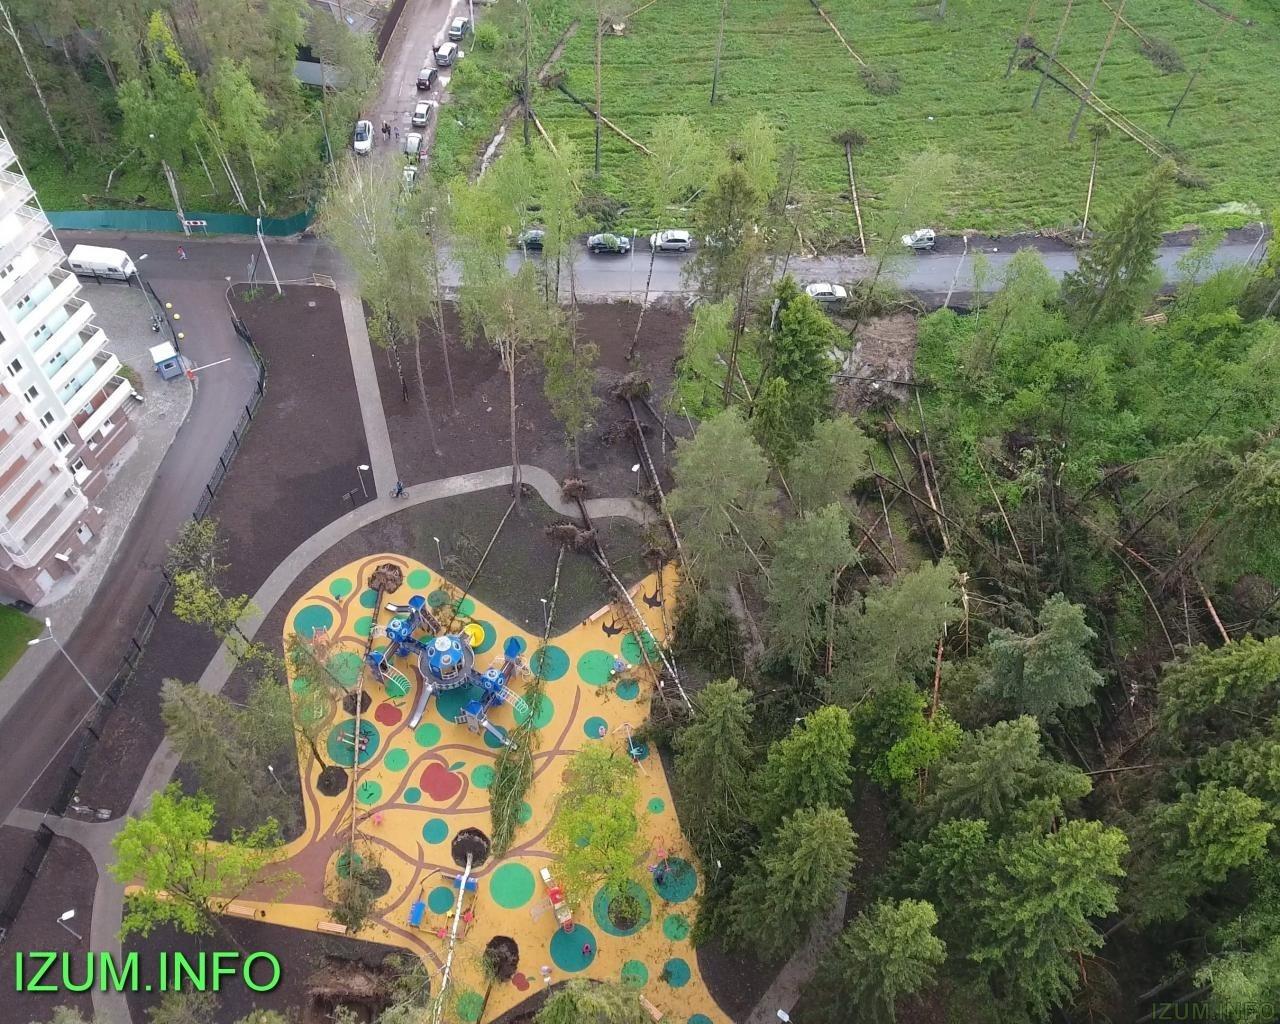 Изумрудные холмы парк после урагана (9).jpg